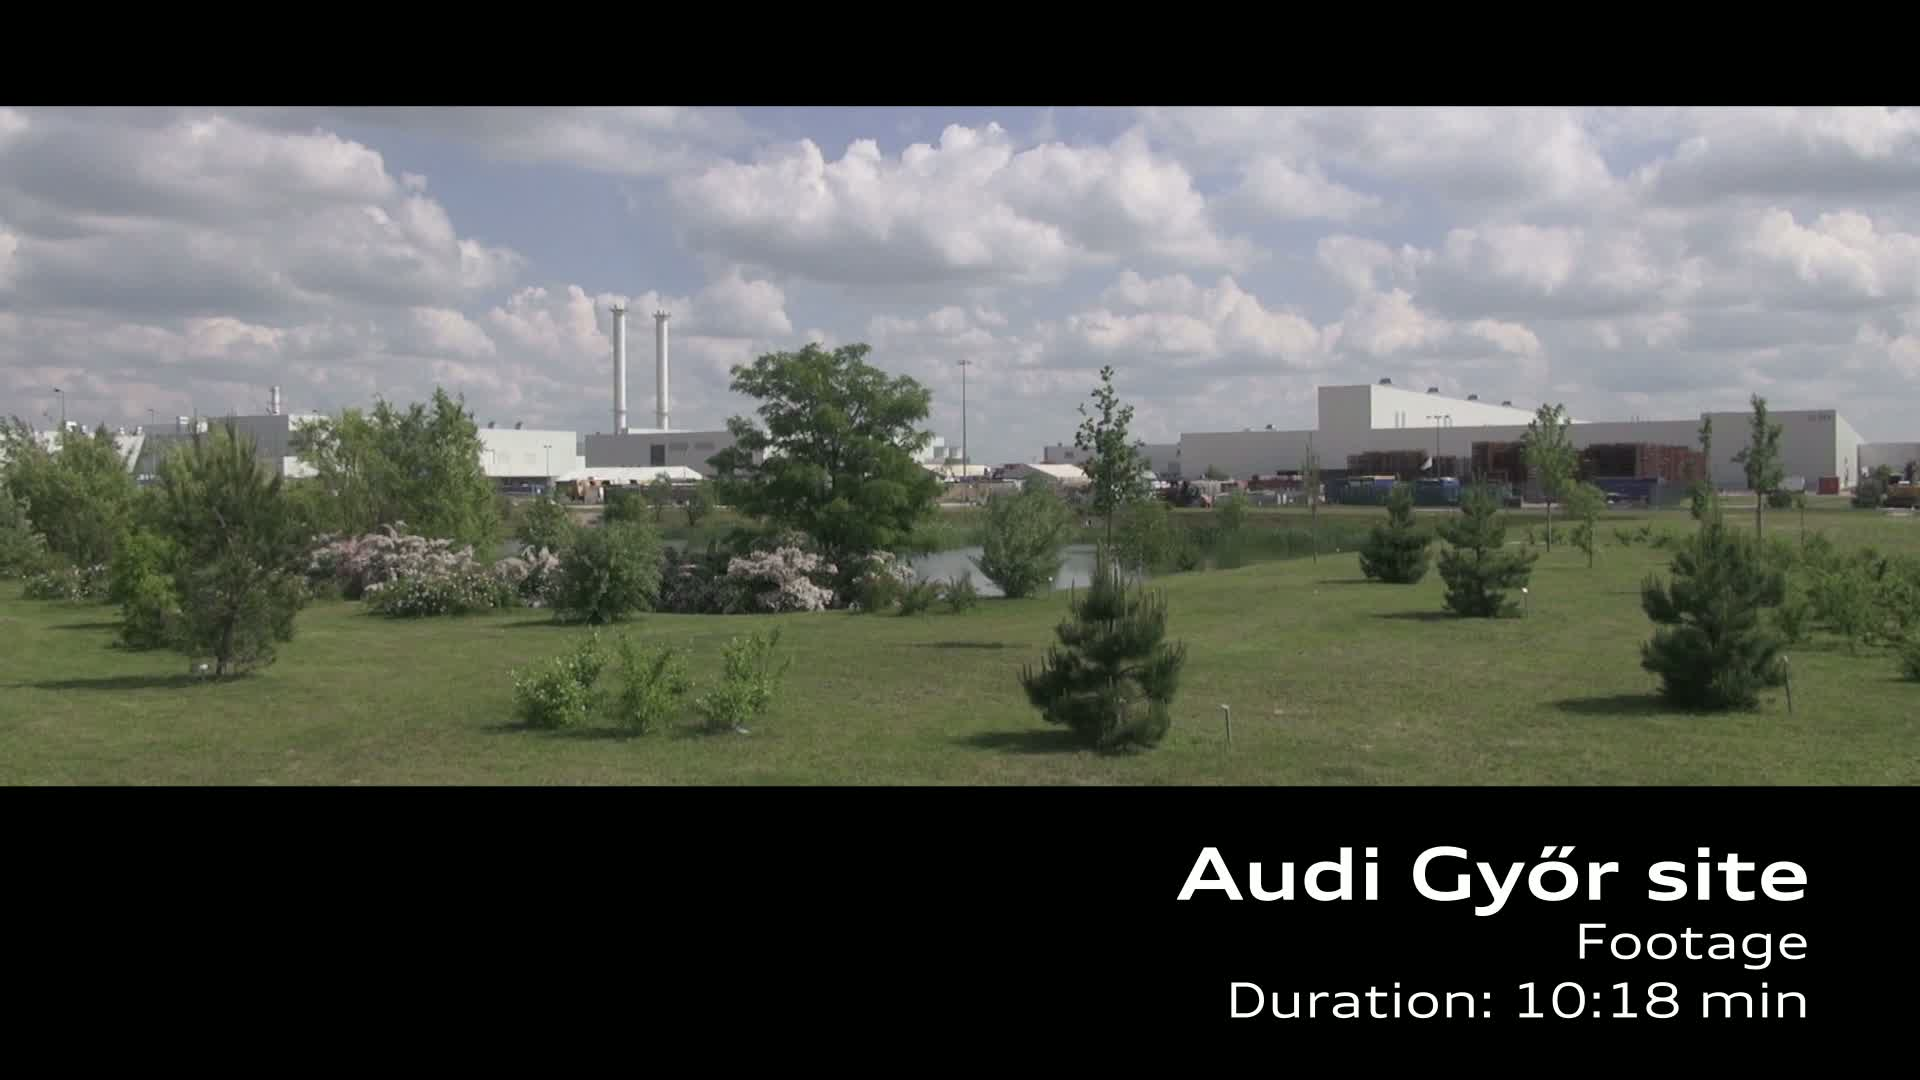 Audi Standort Györ - Produktion A3 Limousine Footage